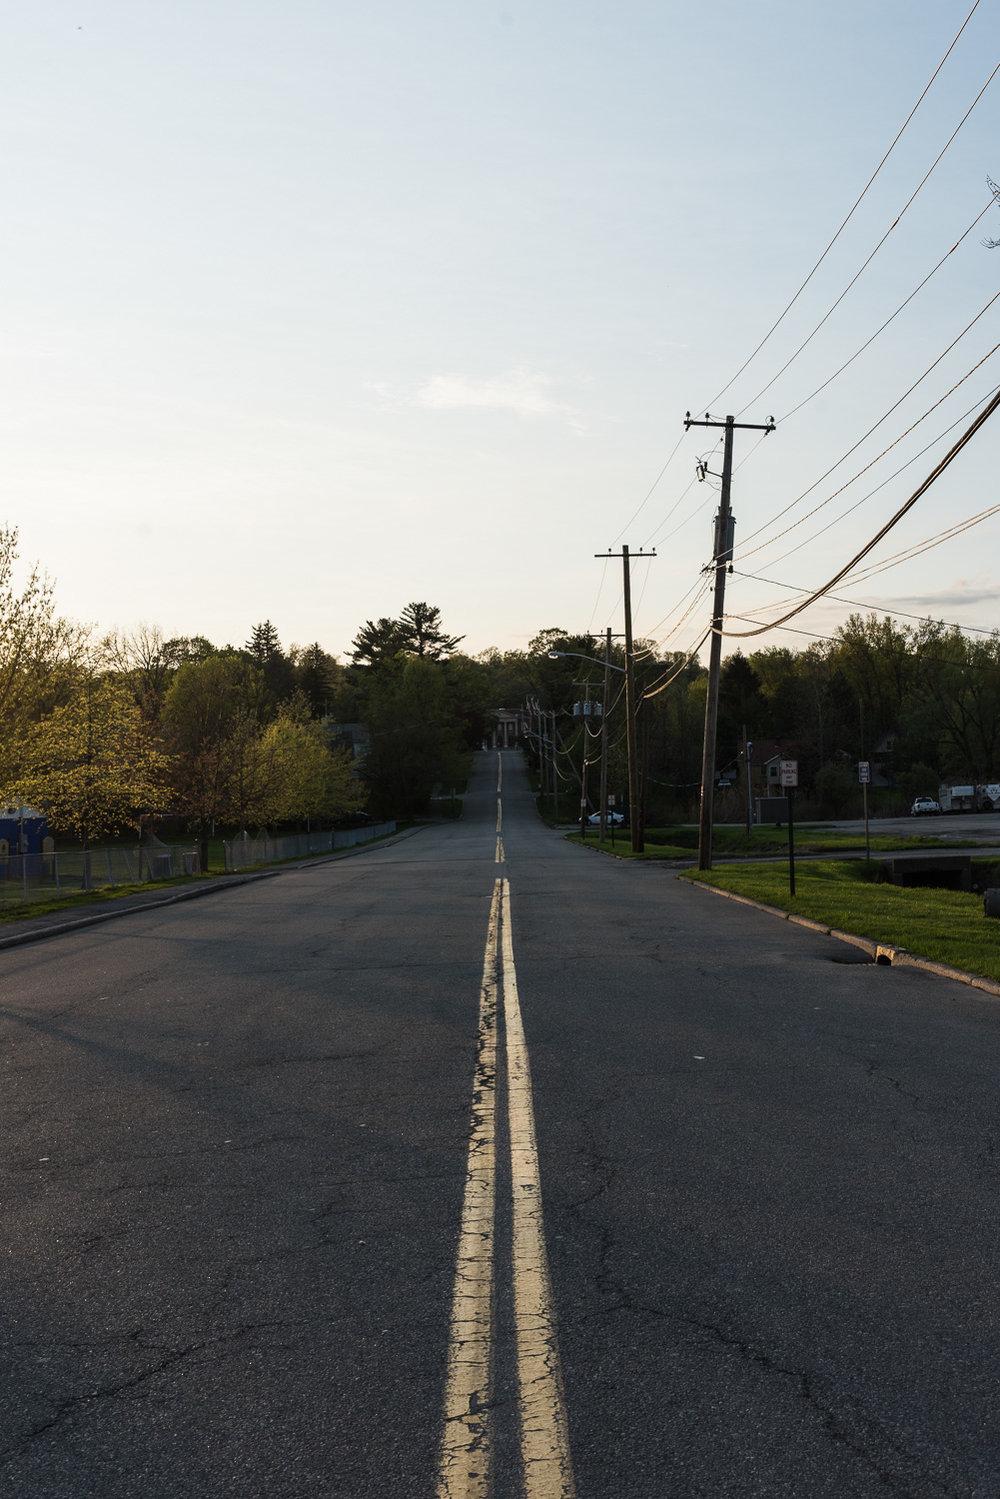 April, 2017